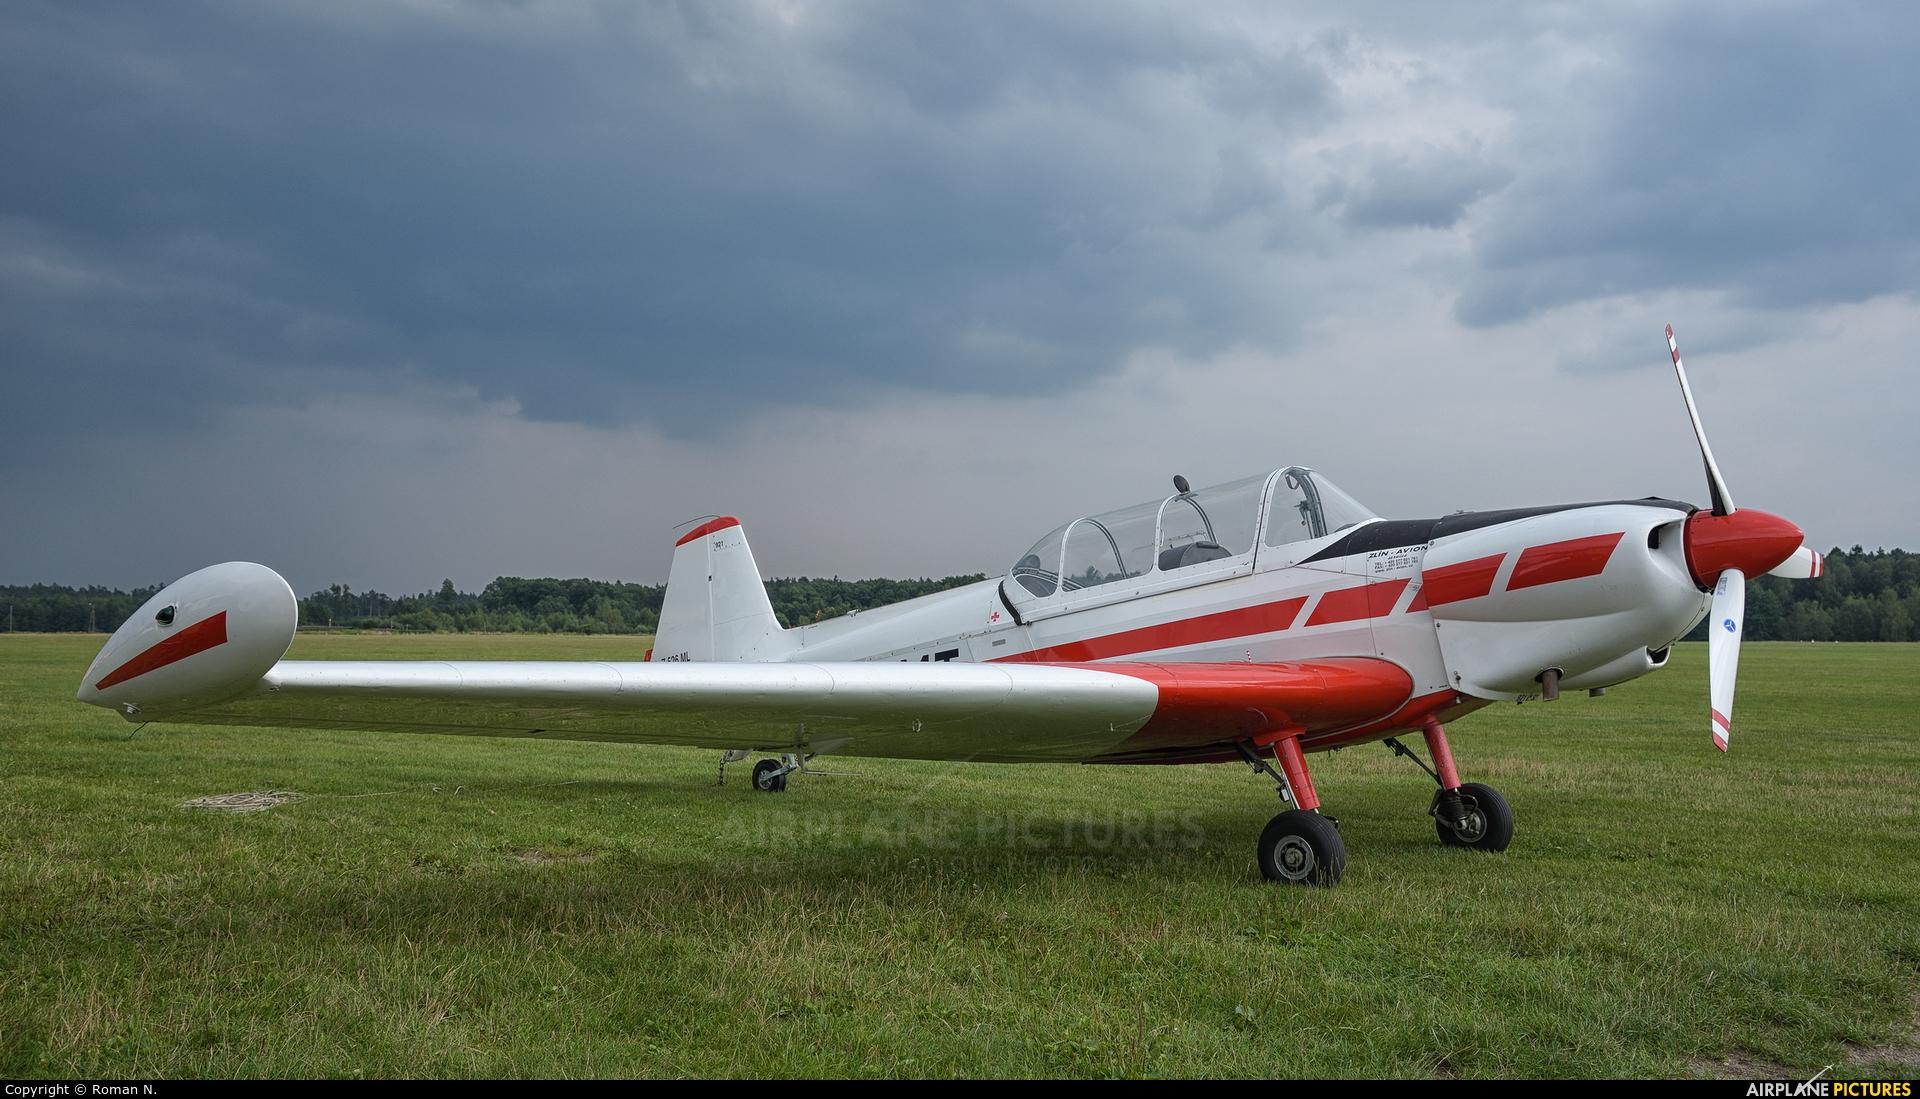 Aeroclub ROW SP-EMT aircraft at Rybnik - Gotartowice